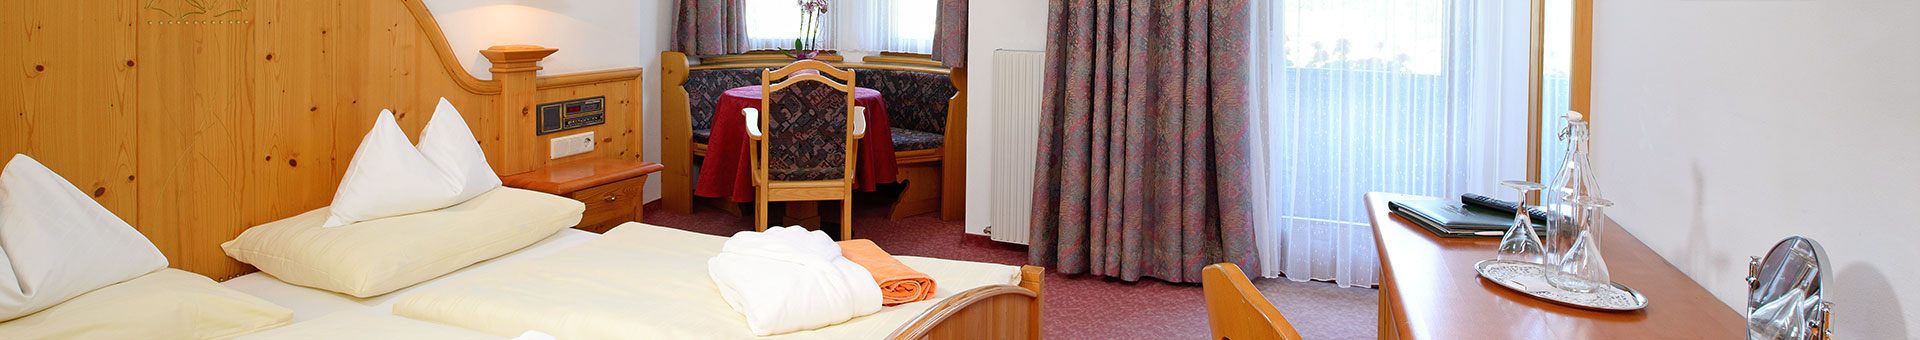 Zimmer in Flachau im Salzburger Land, Hotel Garni Santa Barbara